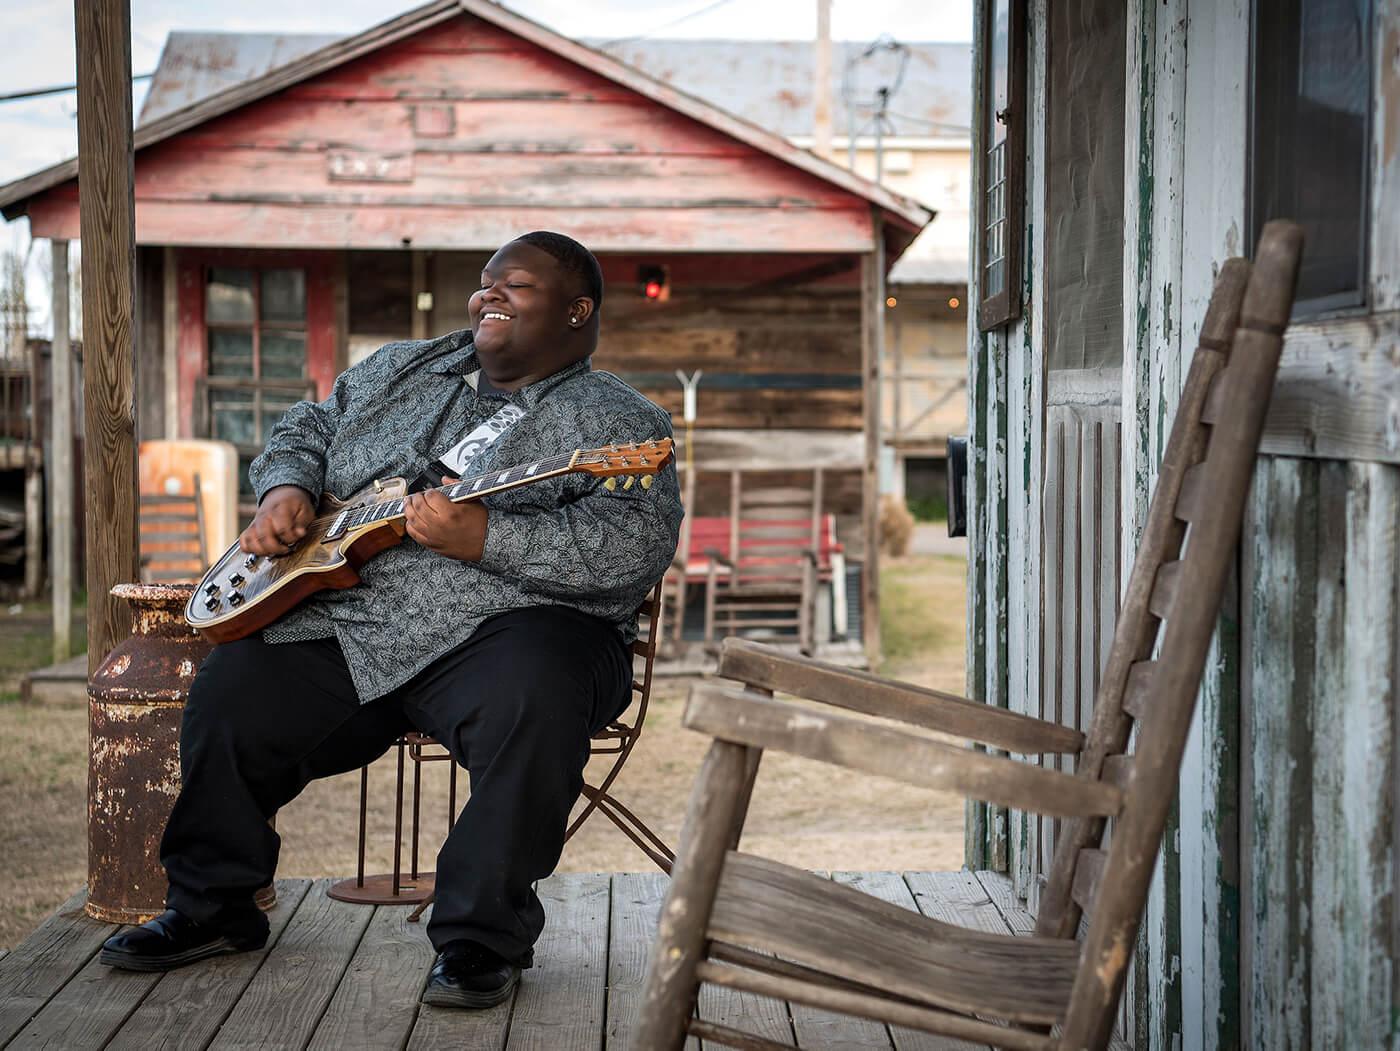 Kingfish sitting outside porch playing guitar